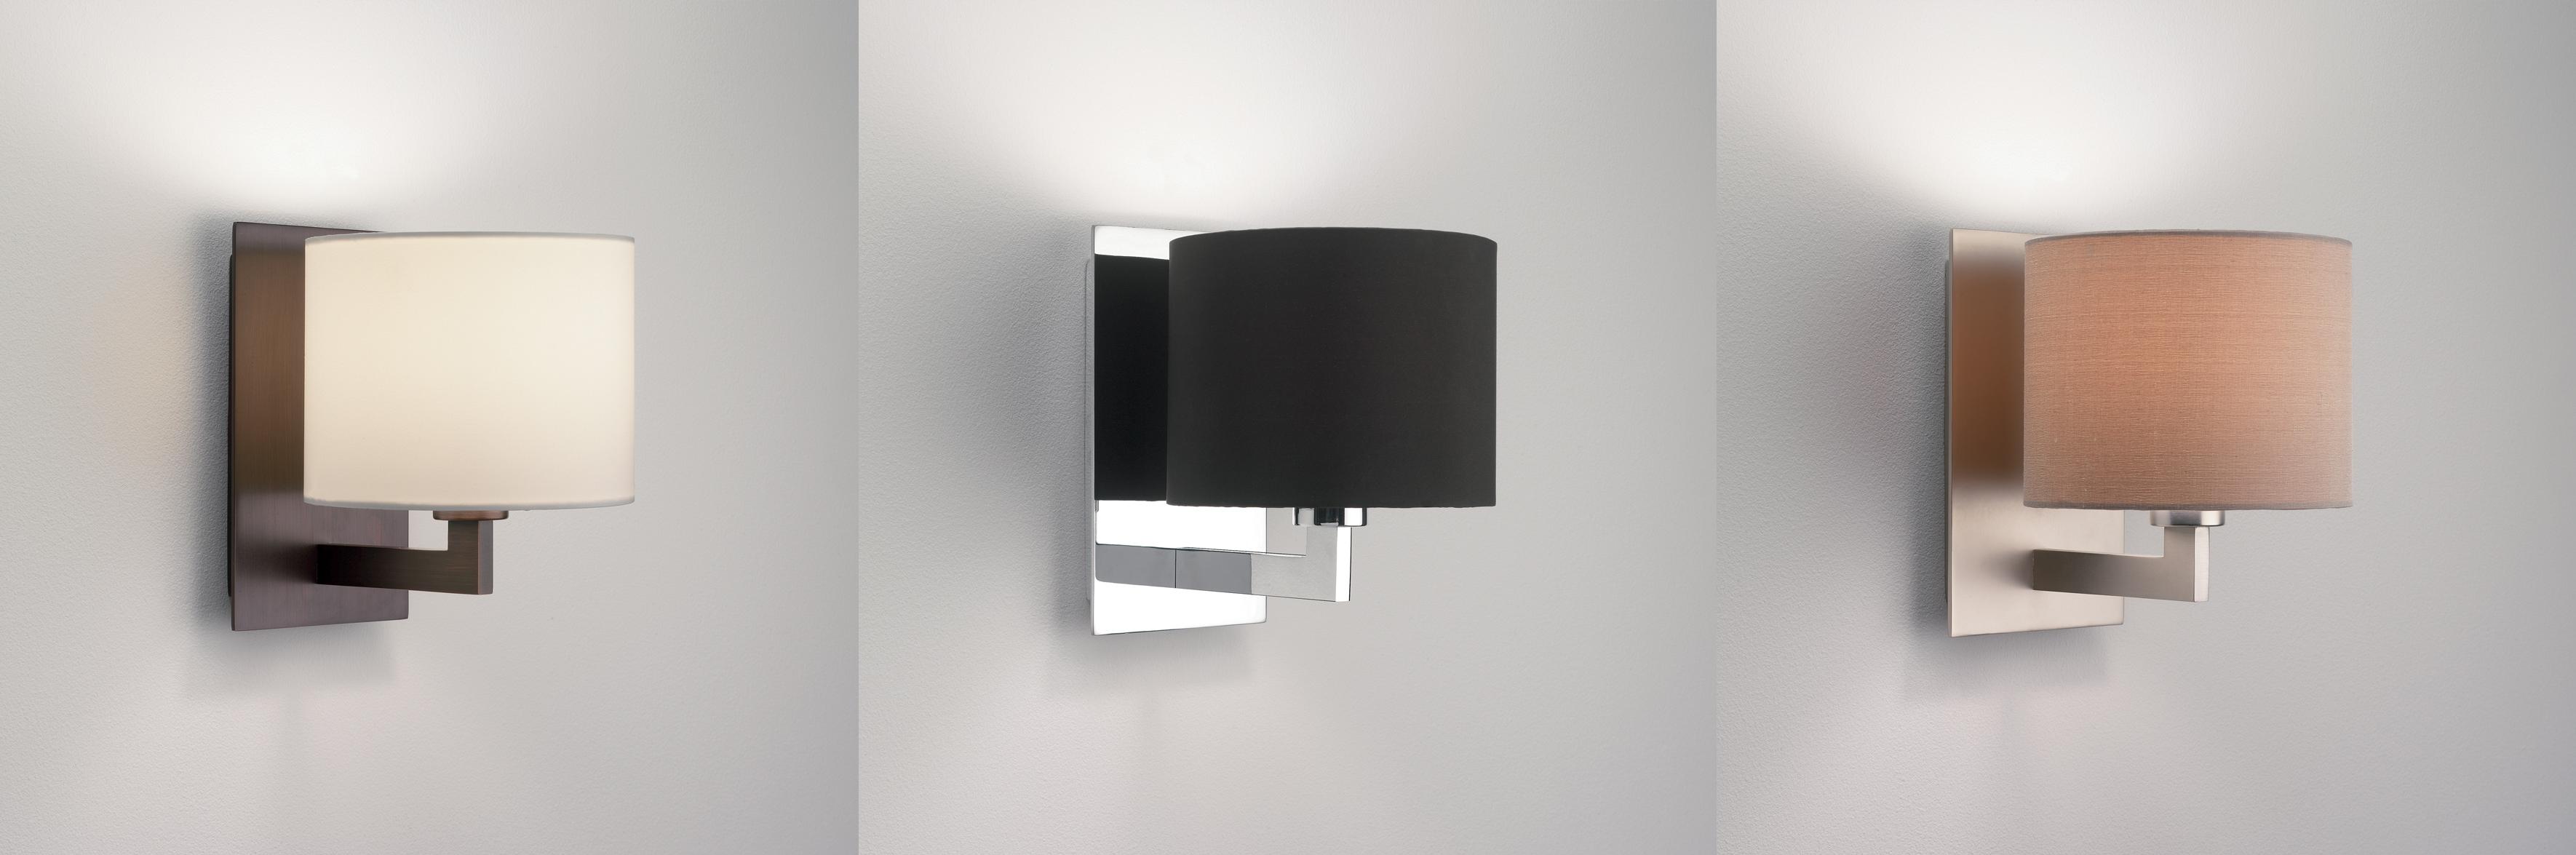 Astro olan lampshade wall light 60w e14 chrome nickel bronze shade sentinel astro olan lampshade wall light 60w e14 chrome nickel bronze shade options aloadofball Gallery